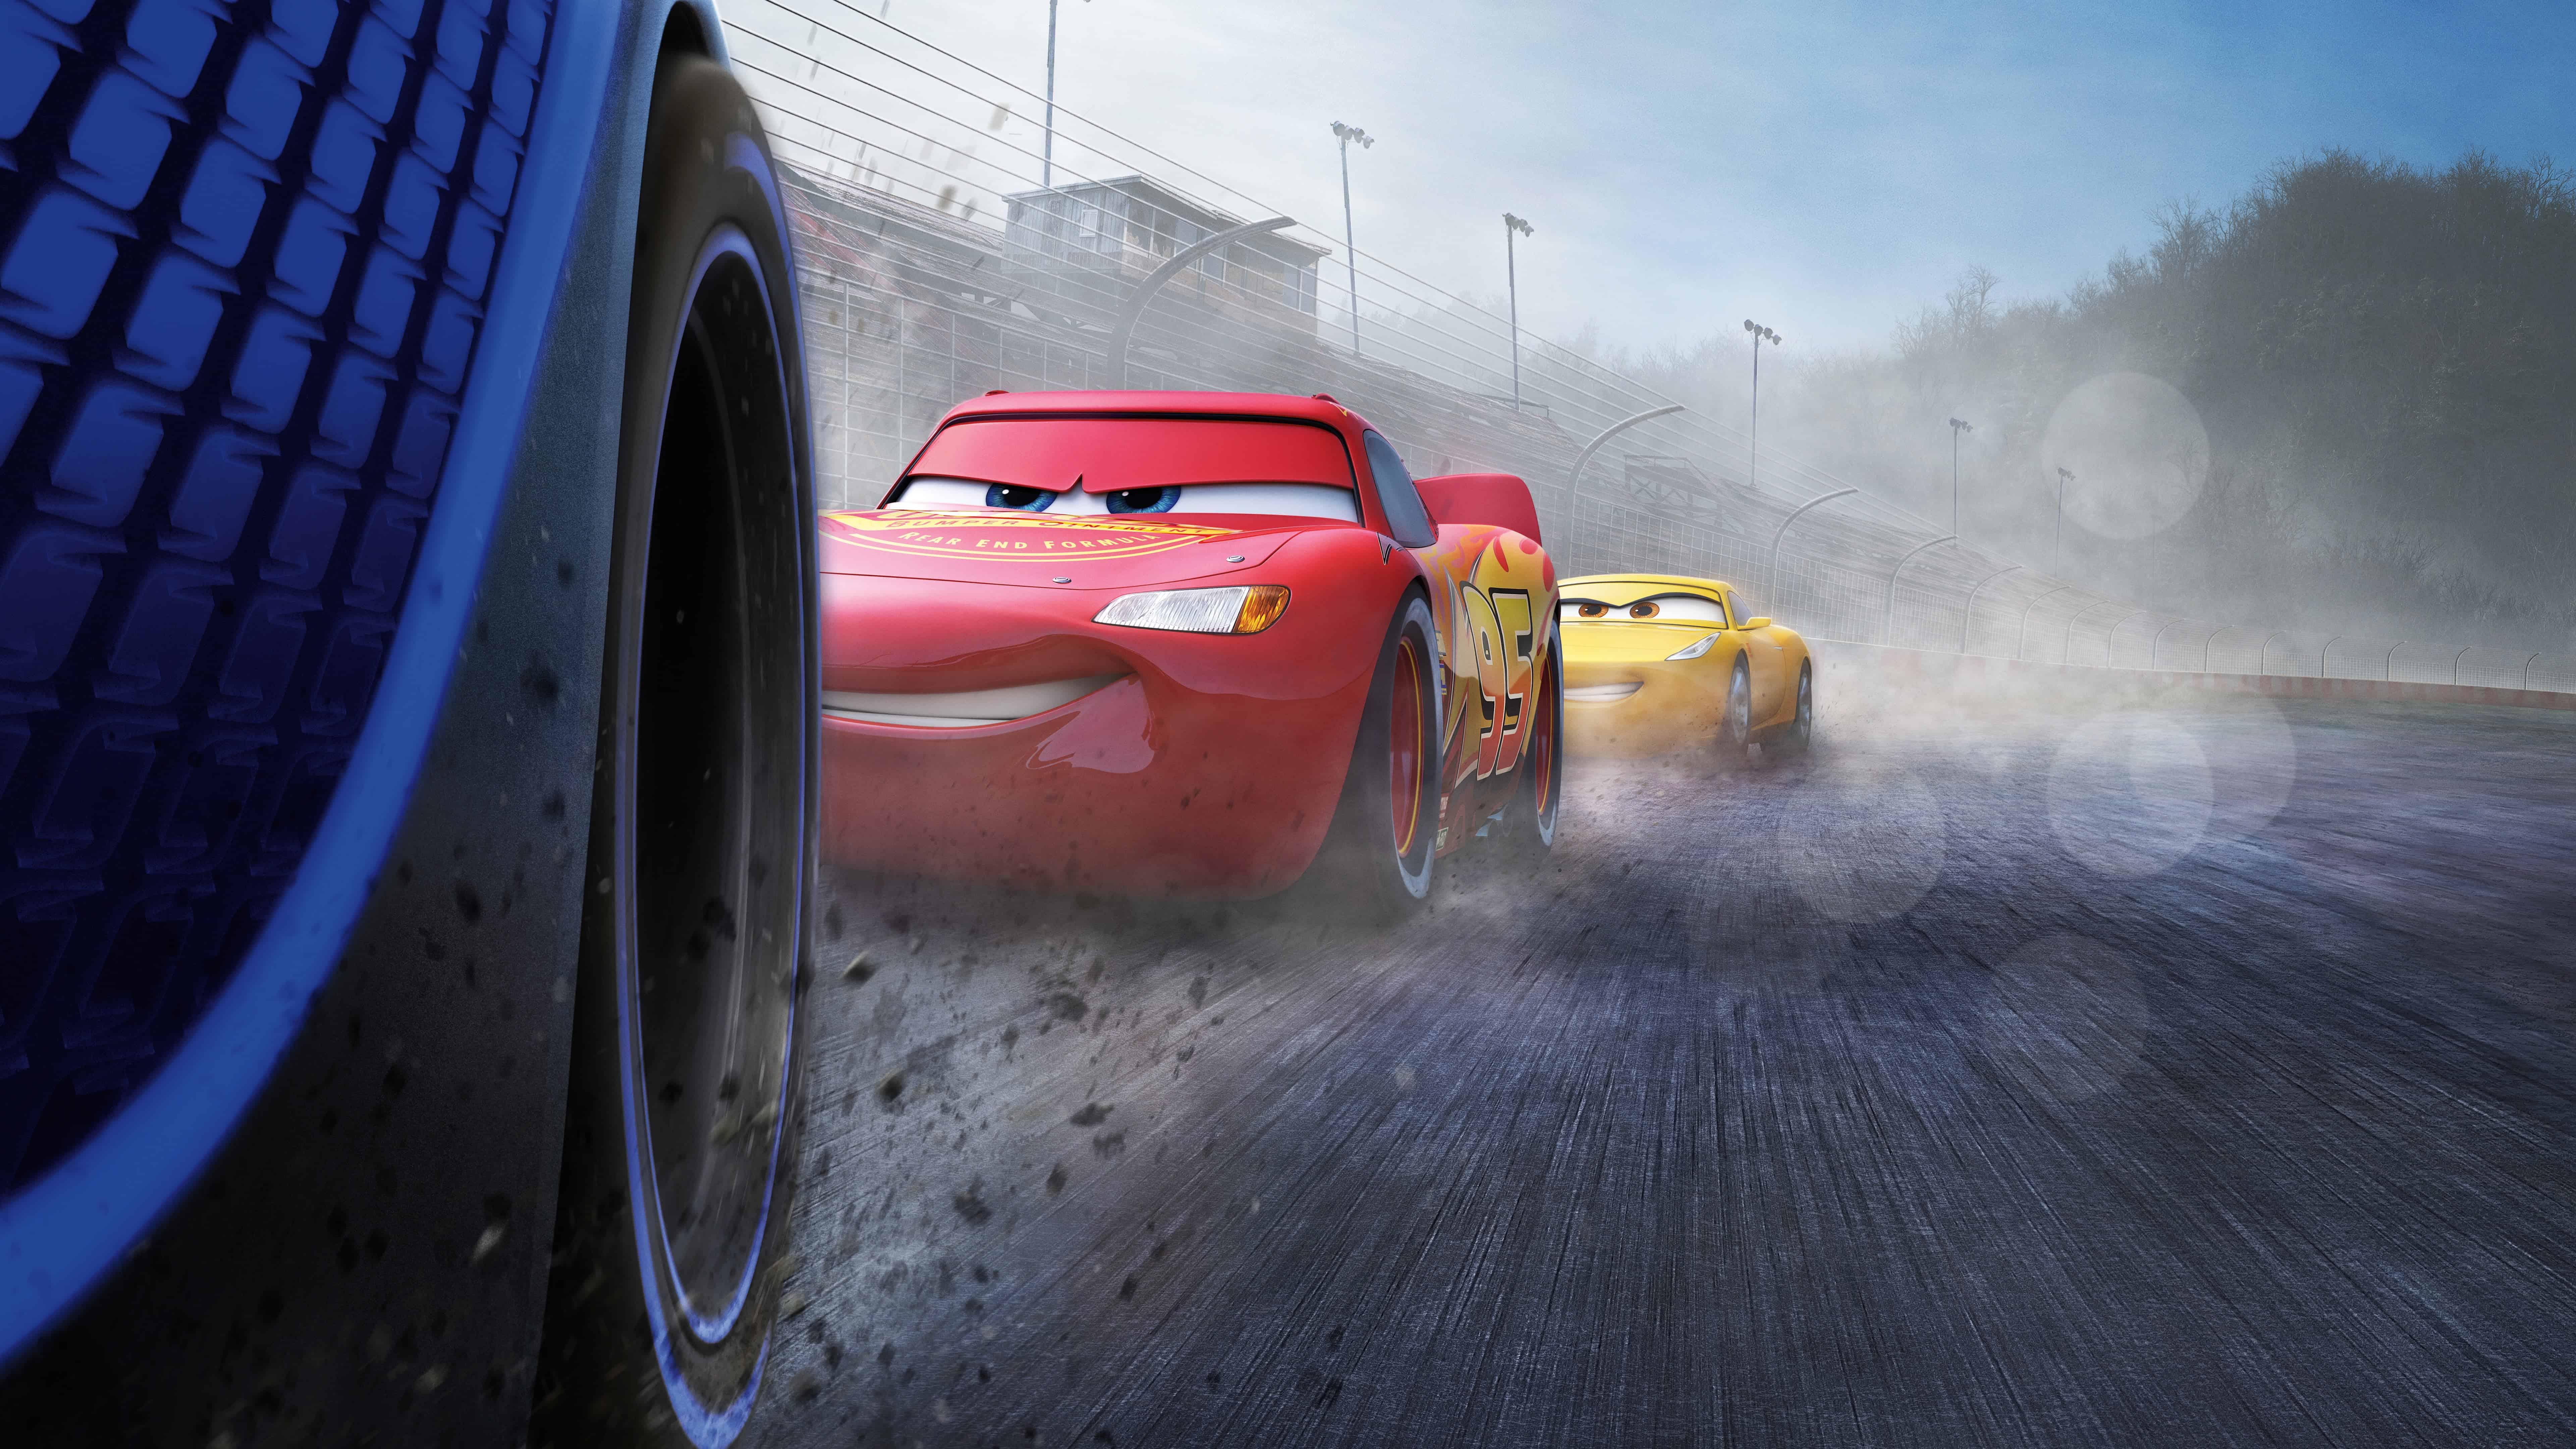 cars 3 jackson storm vs cruz ramirez uhd 8k wallpaper